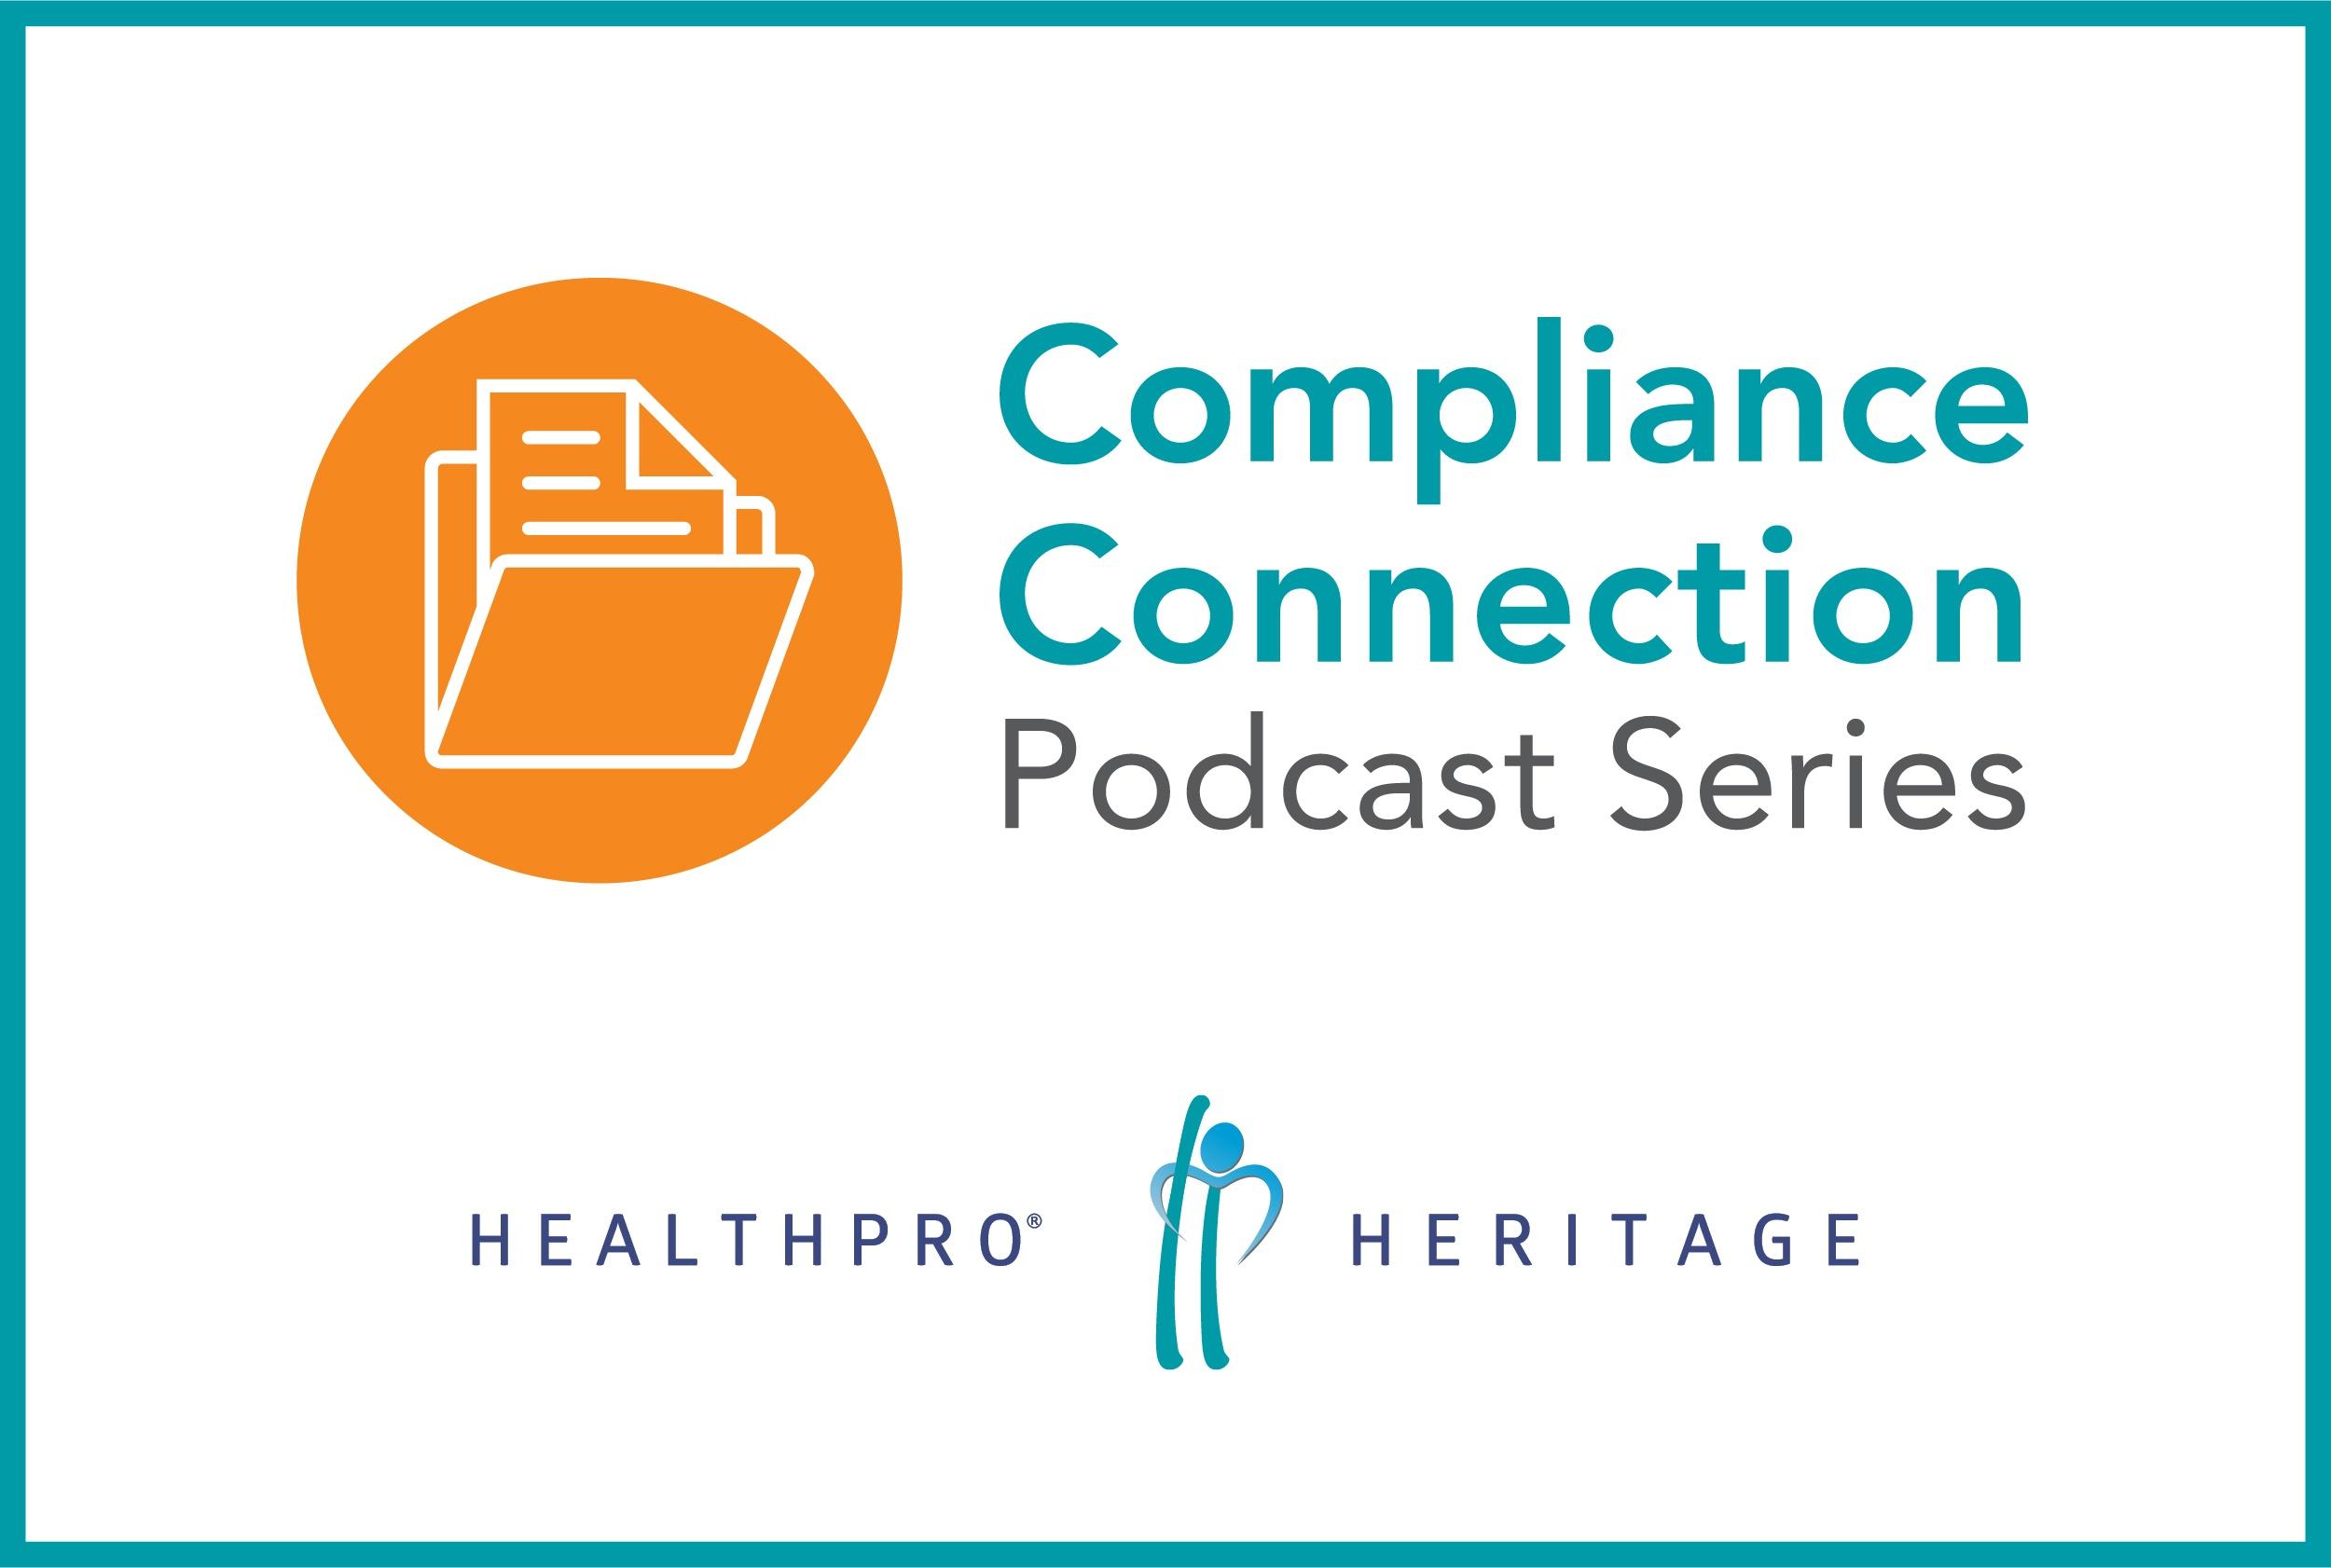 062017-CompliancePodcast_BlogLogo2.jpg